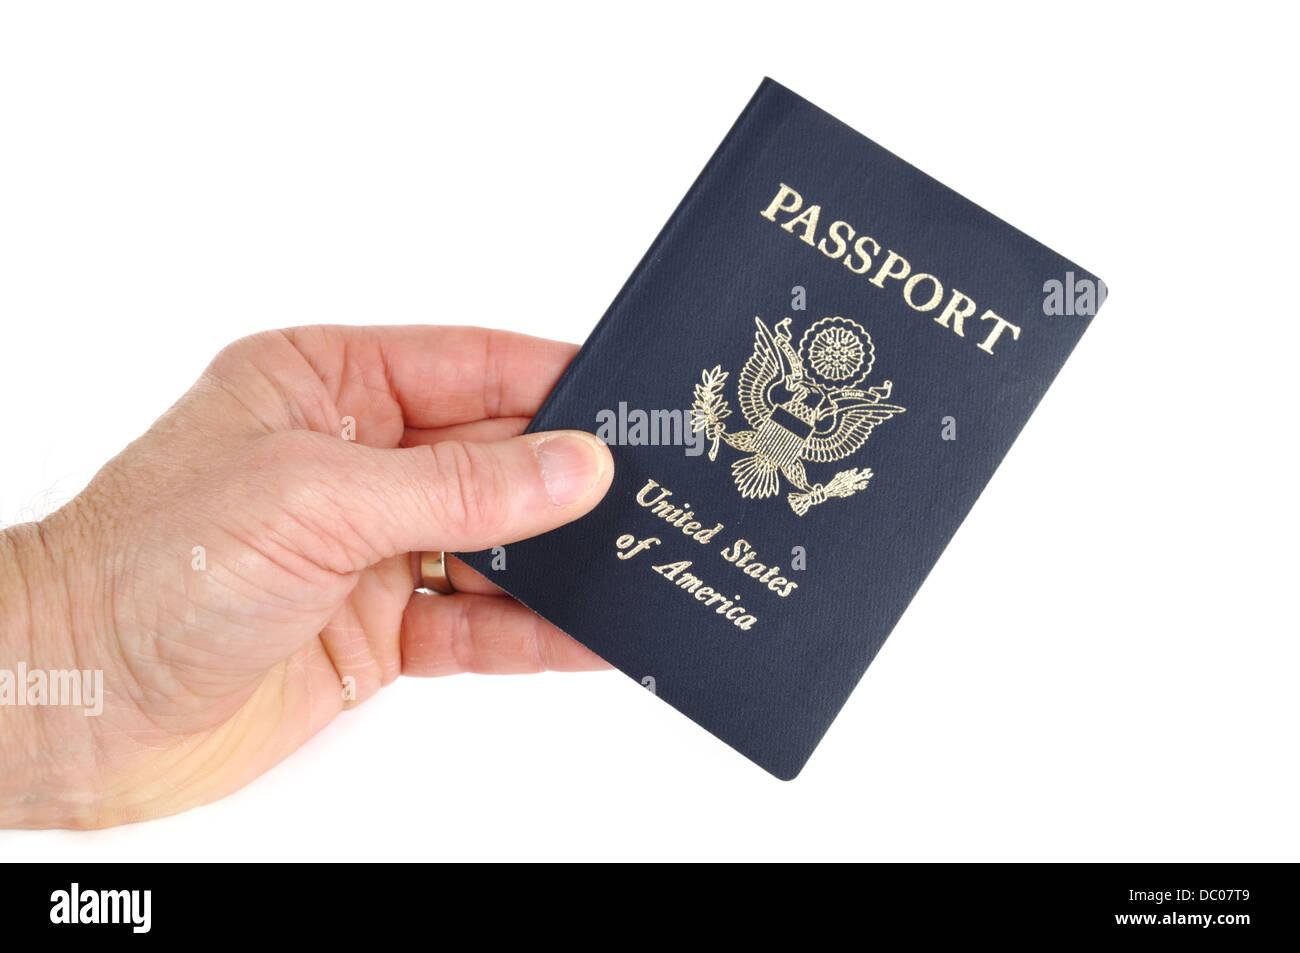 Hand holding a US passport - Stock Image